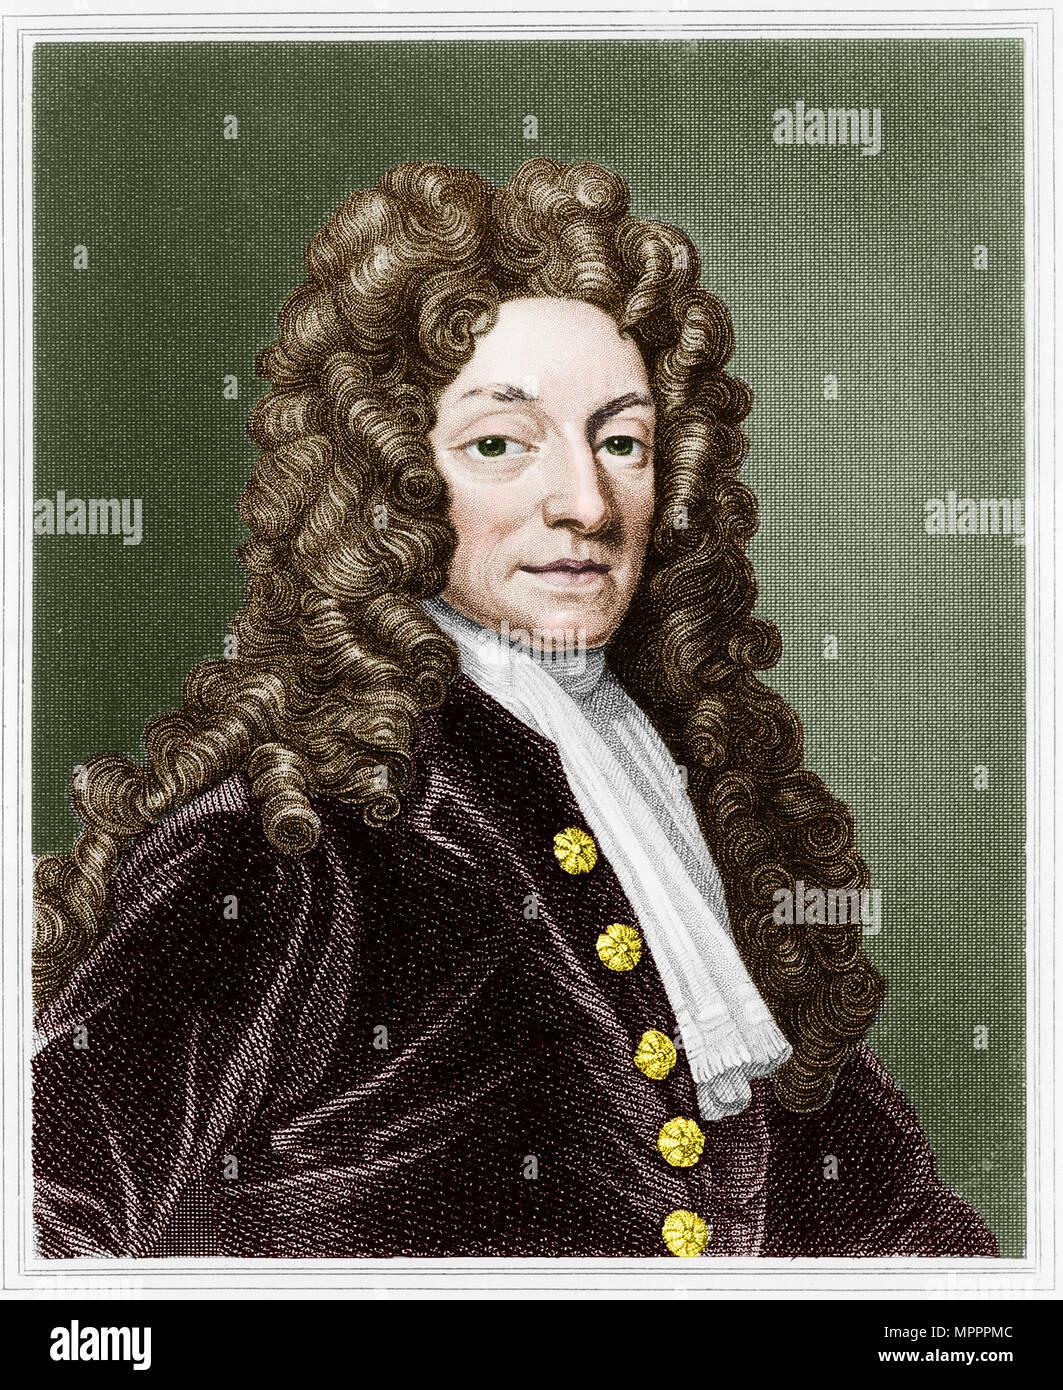 Sir Christopher Wren Stock Photos & Sir Christopher Wren